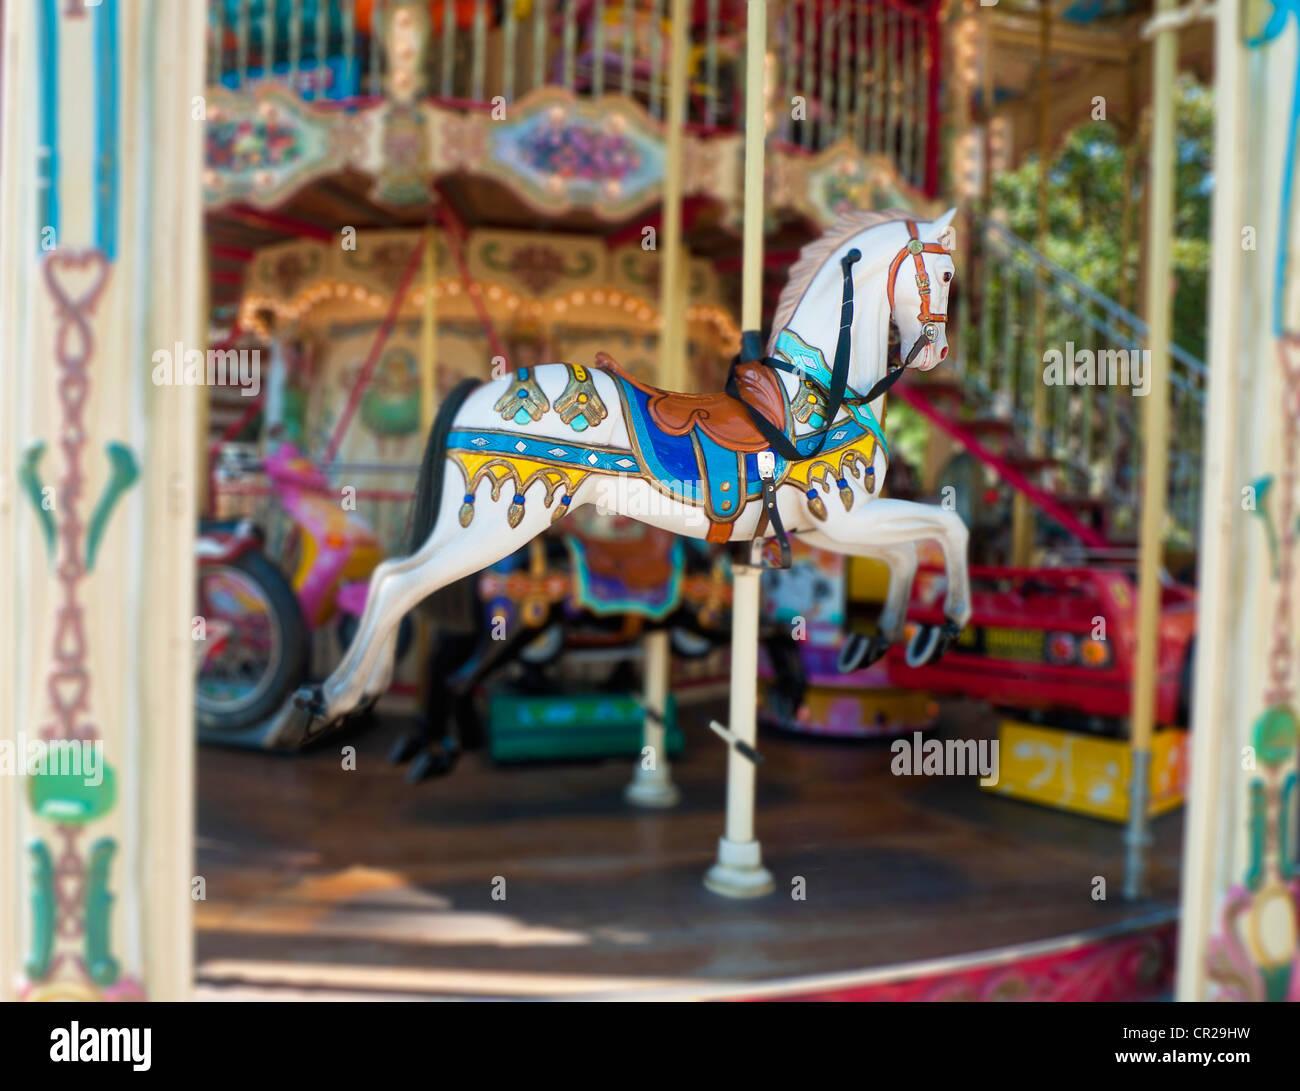 Carousel horse ride Photo Stock